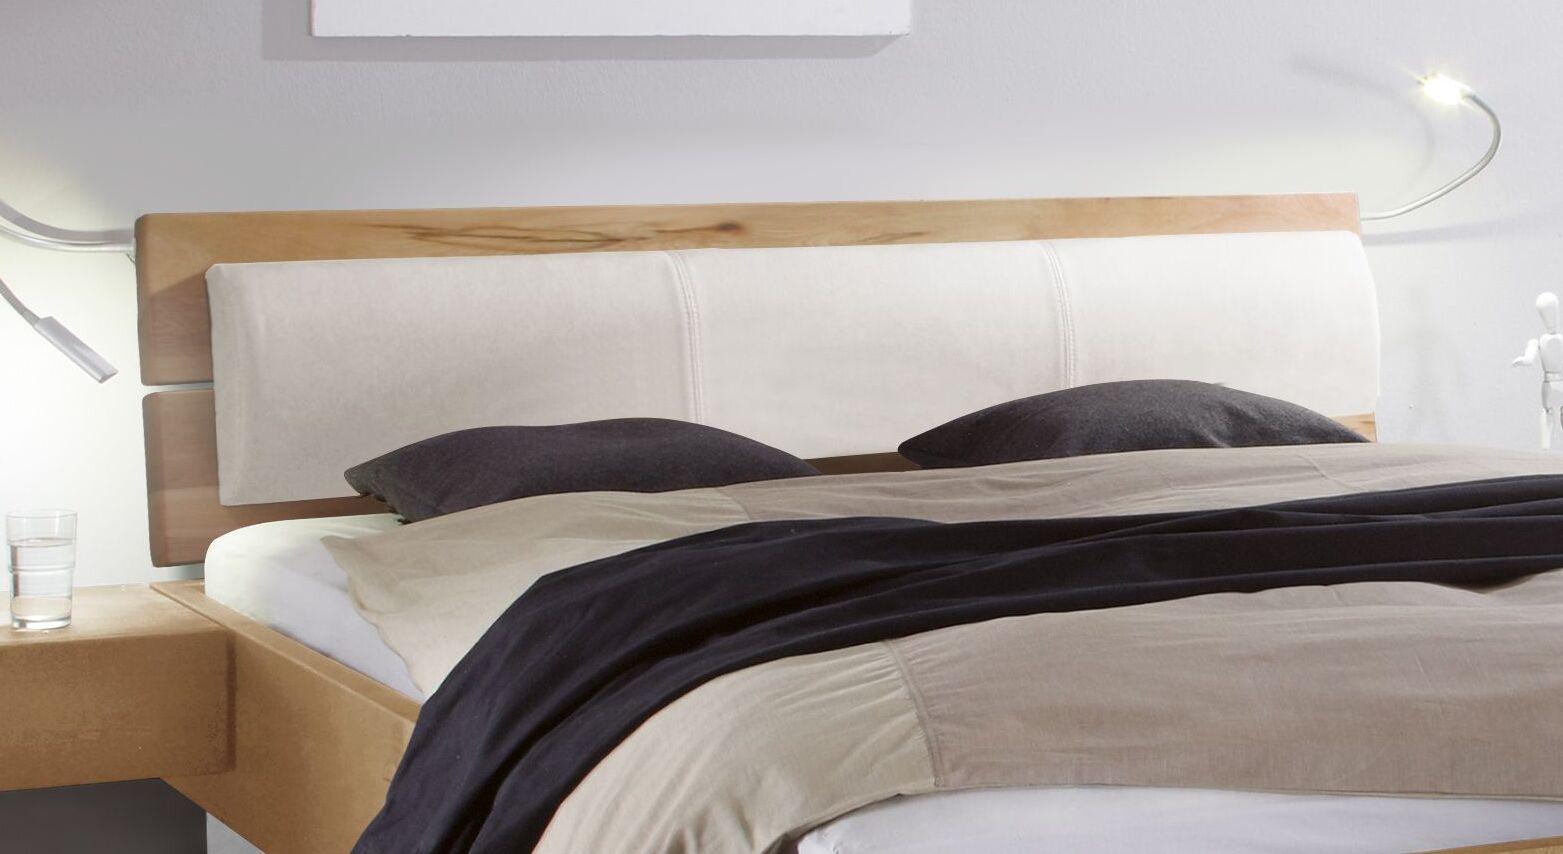 Massives Bett Patea mit geteiltem Kopfteil